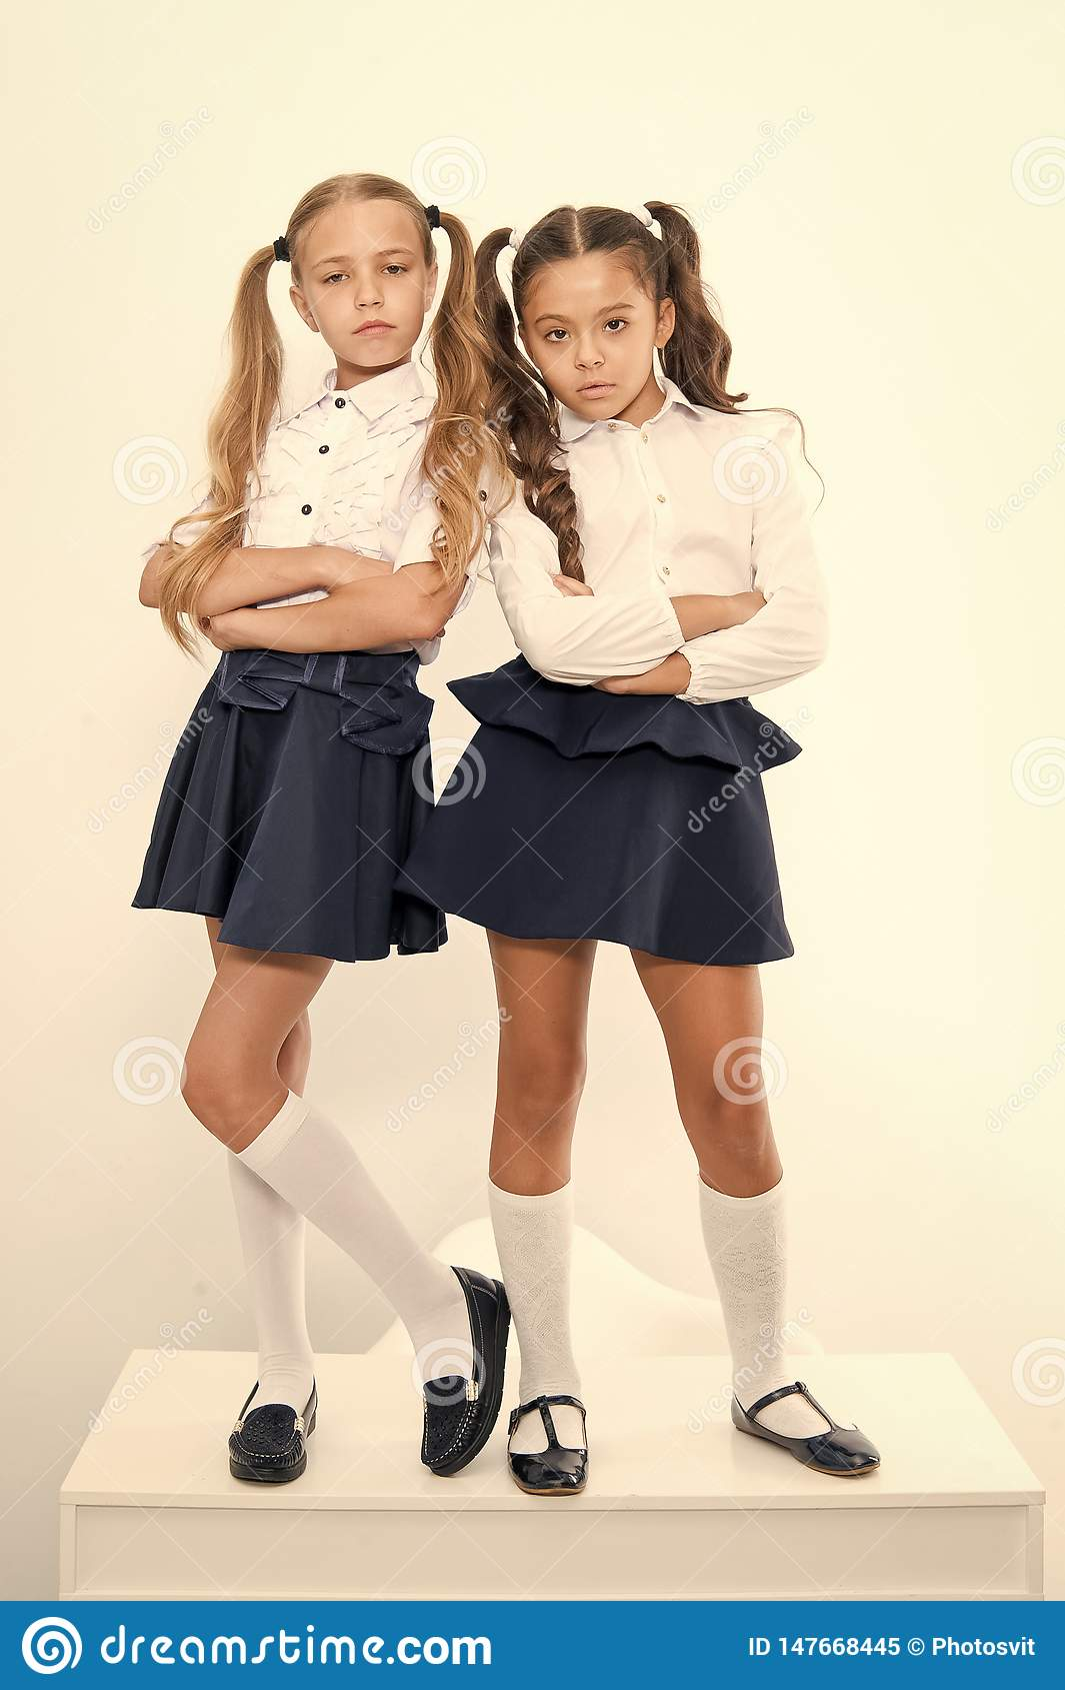 Schoolgirls Haughty Arrogant With Ponytails Hairstyle Best Friends Excellent Pupils Perfect Schoolgirls Tidy Fancy Stock Image Image Of List Fashion 147668445